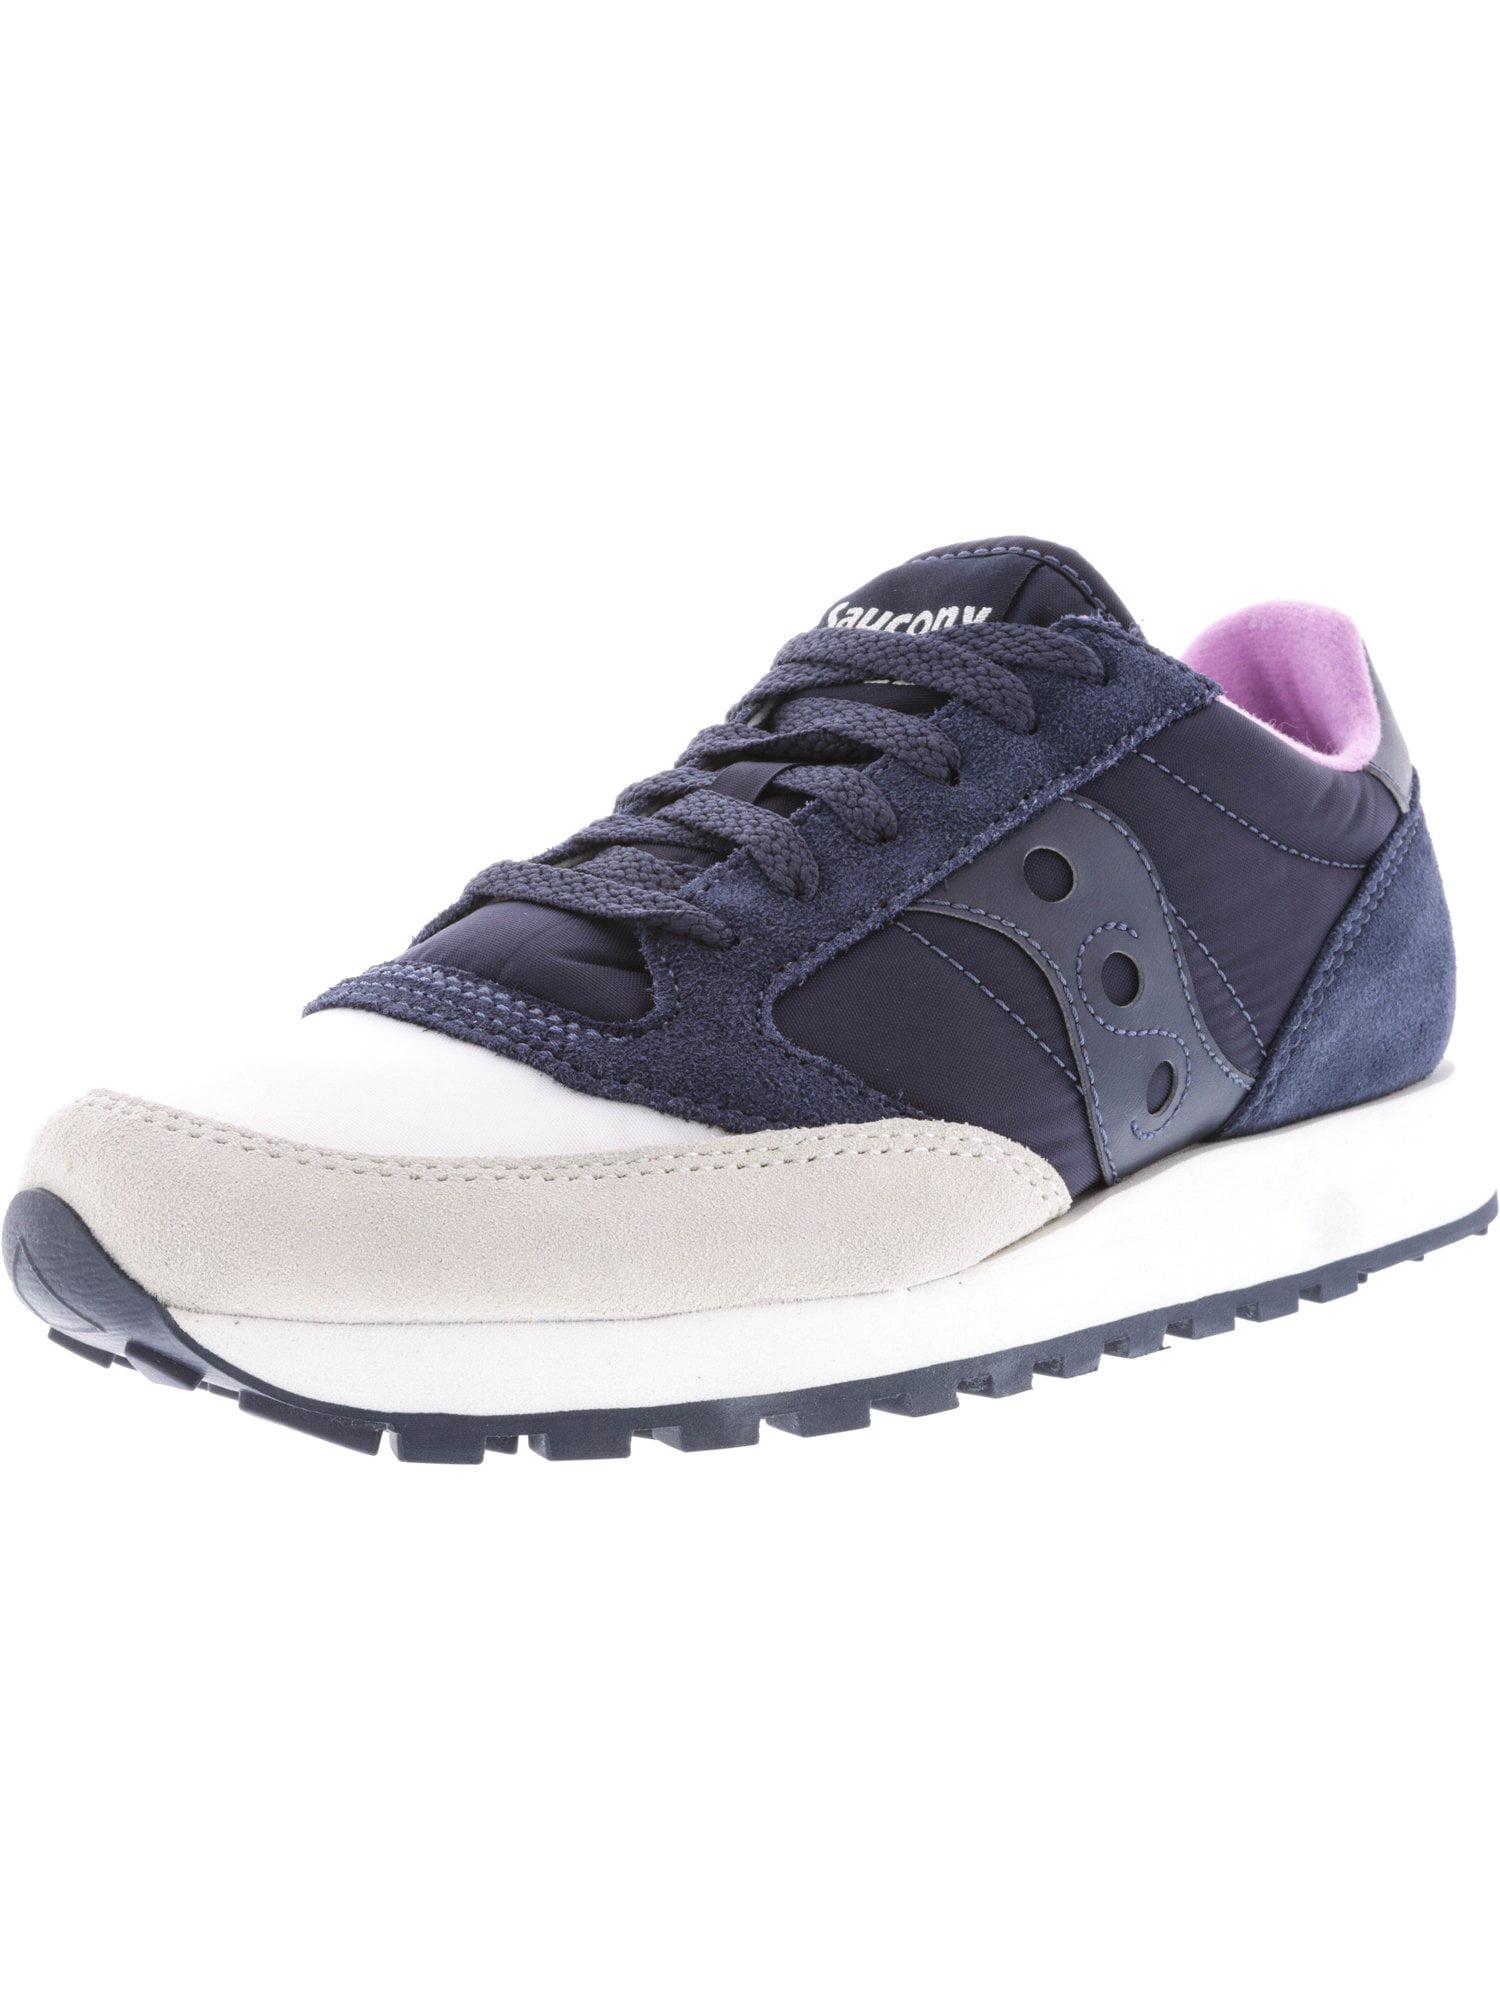 Saucony Women's Jazz Original Cream / Navy Ankle-High Running Shoe - 9.5M